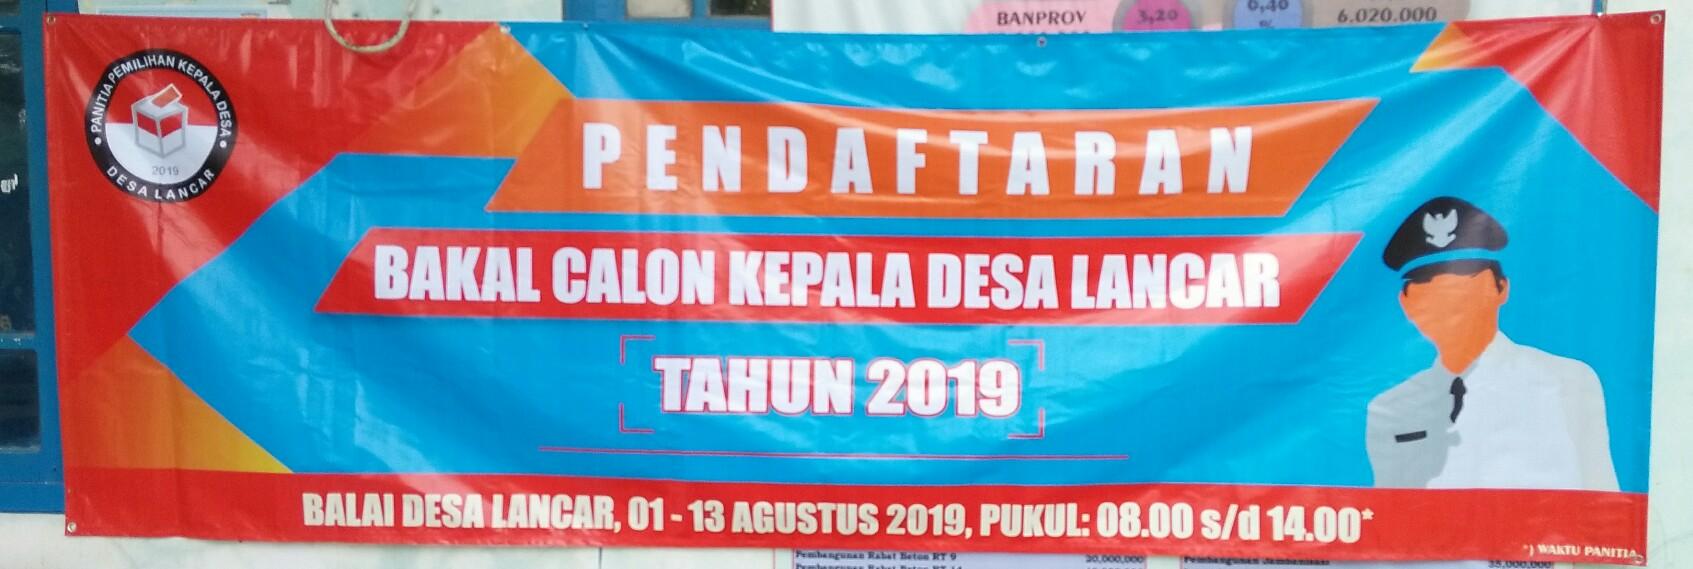 Pendaftaran Bakal Calon Kepala Desa